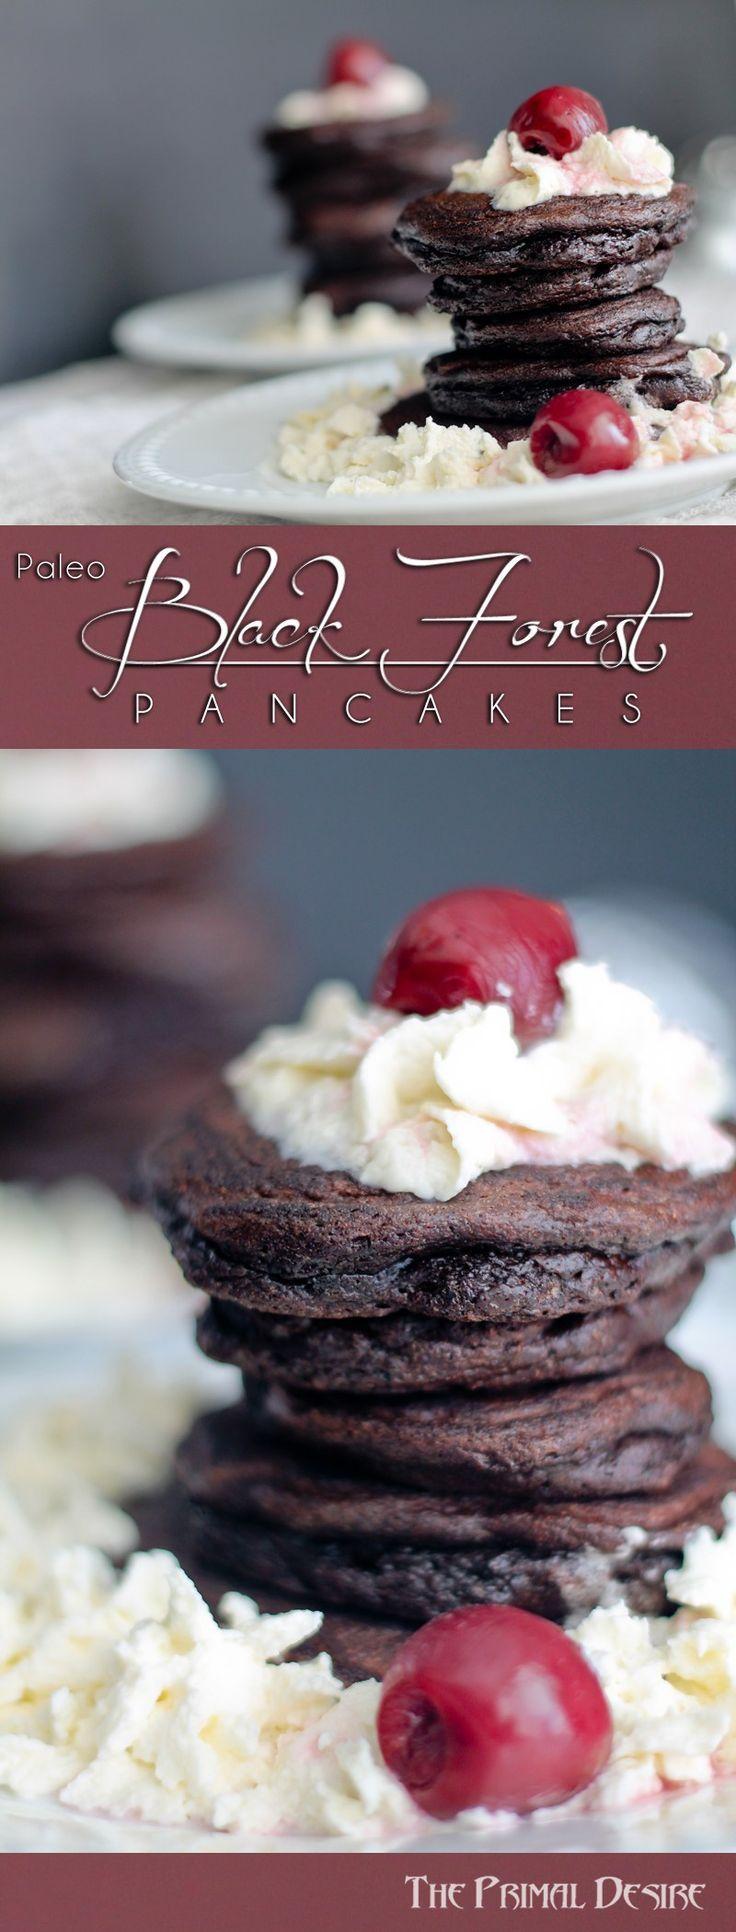 Paleo Black Forest Pancakes - Rich chocolate pancakes, tart cherries ...